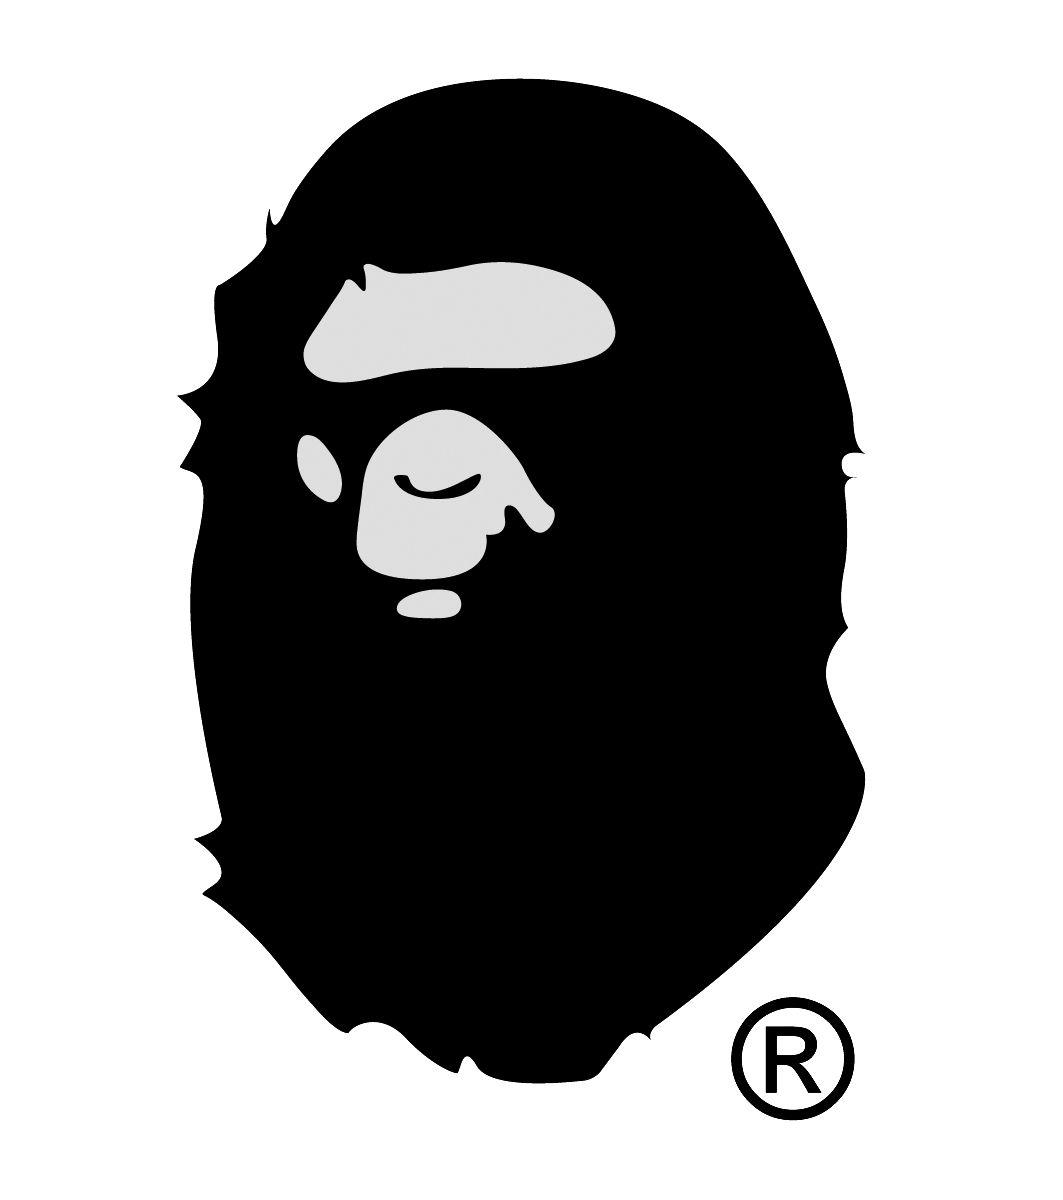 Travis Scott Iphone Wallpaper Pin By Jeremy Matthews On Logo Pinterest Bape Logos